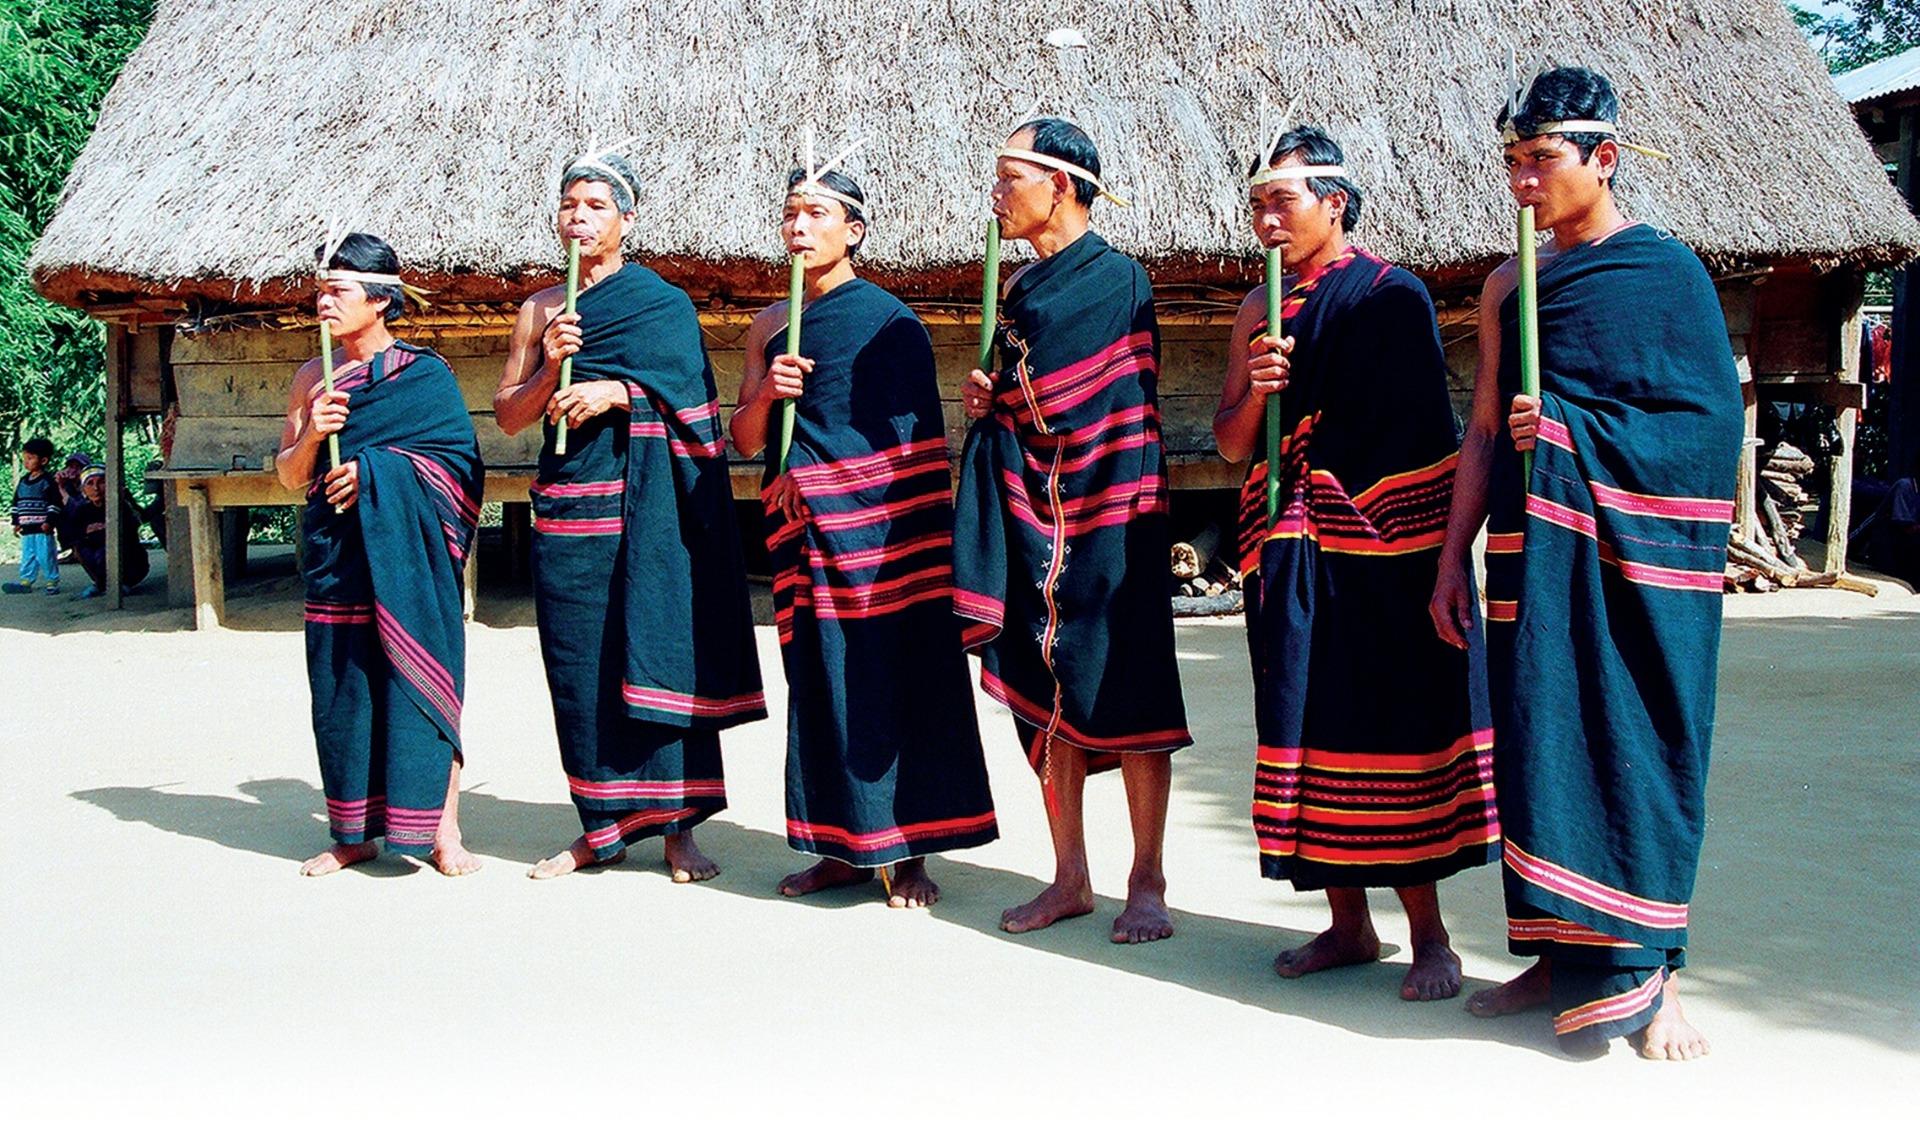 seruling dinh tut - instrumen musik yang dibarengi dengan nyanyian rakyat dari warga etnis gie trieng hinh 0